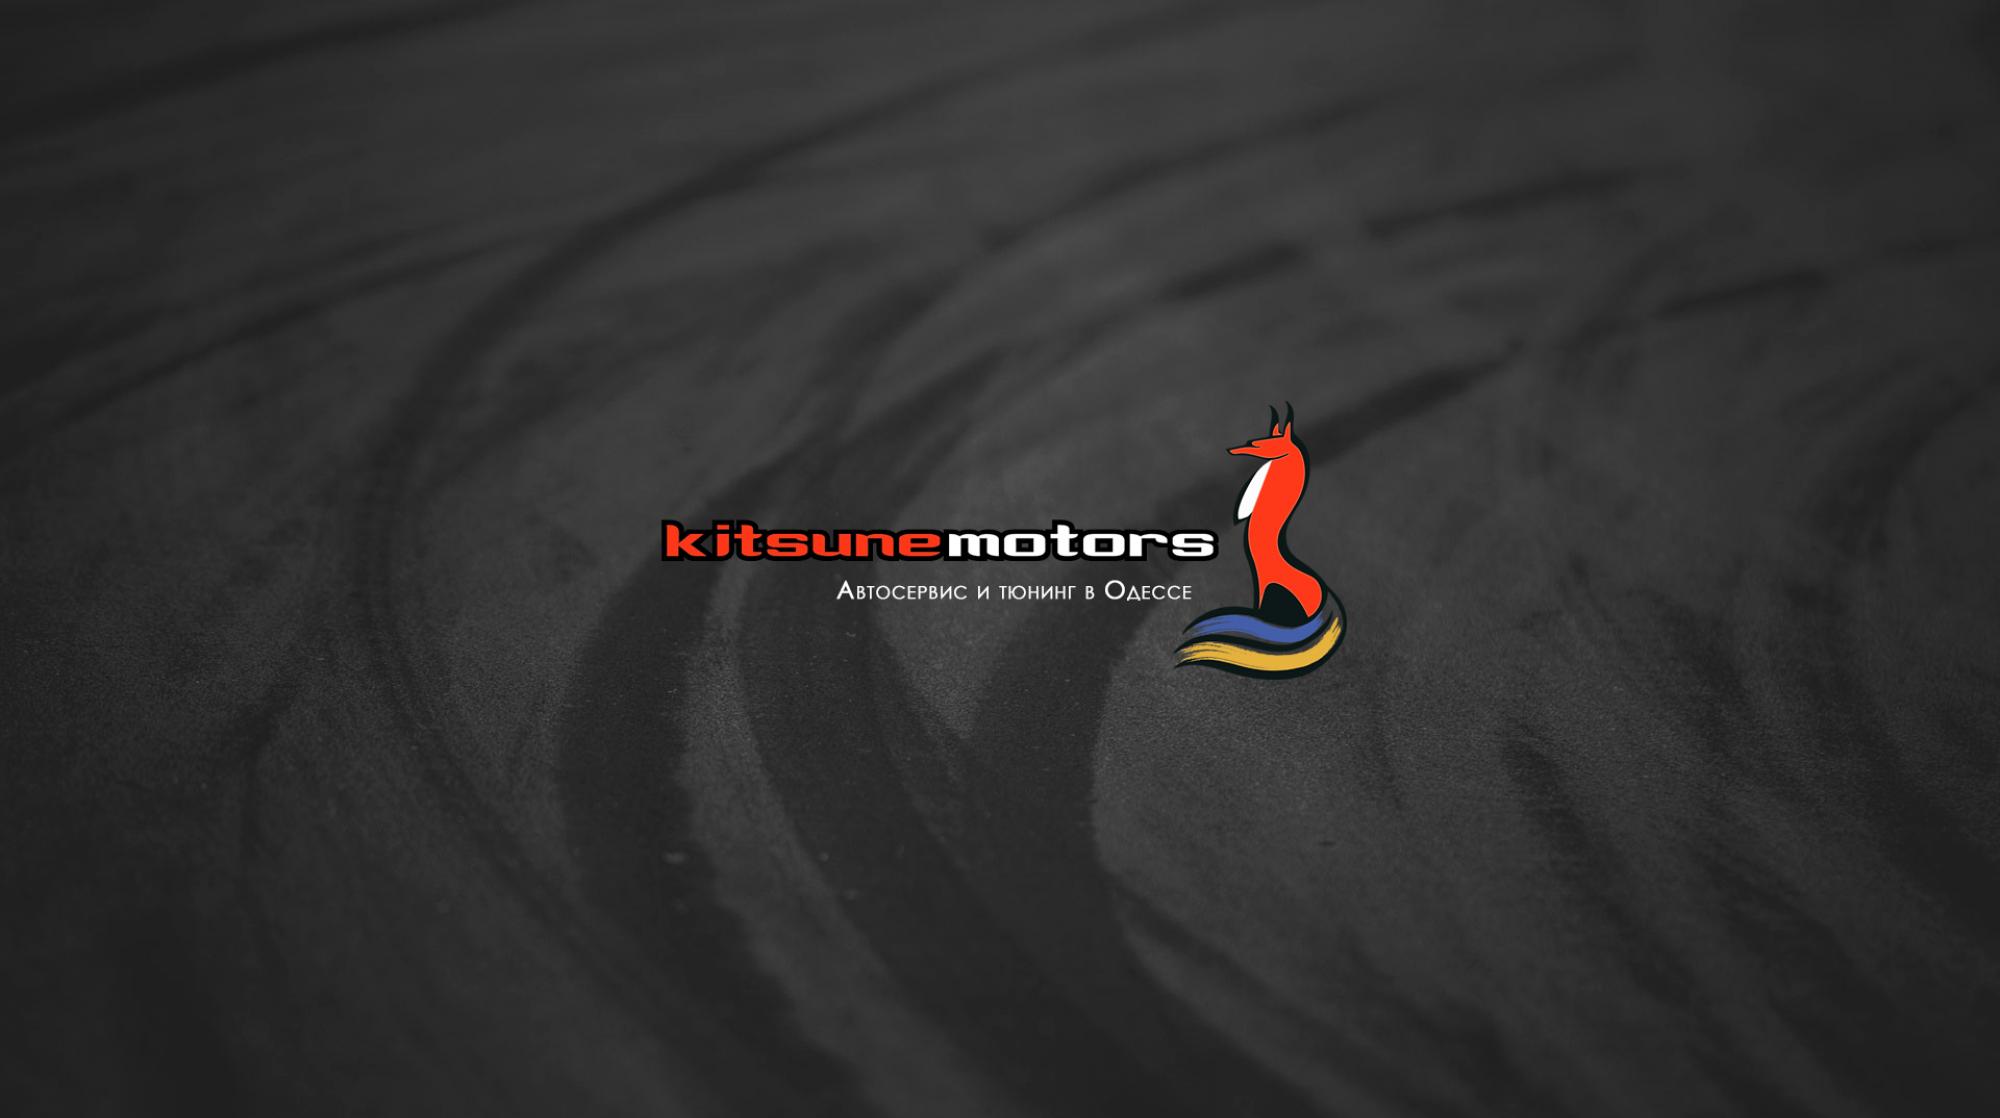 Kitsune Motors